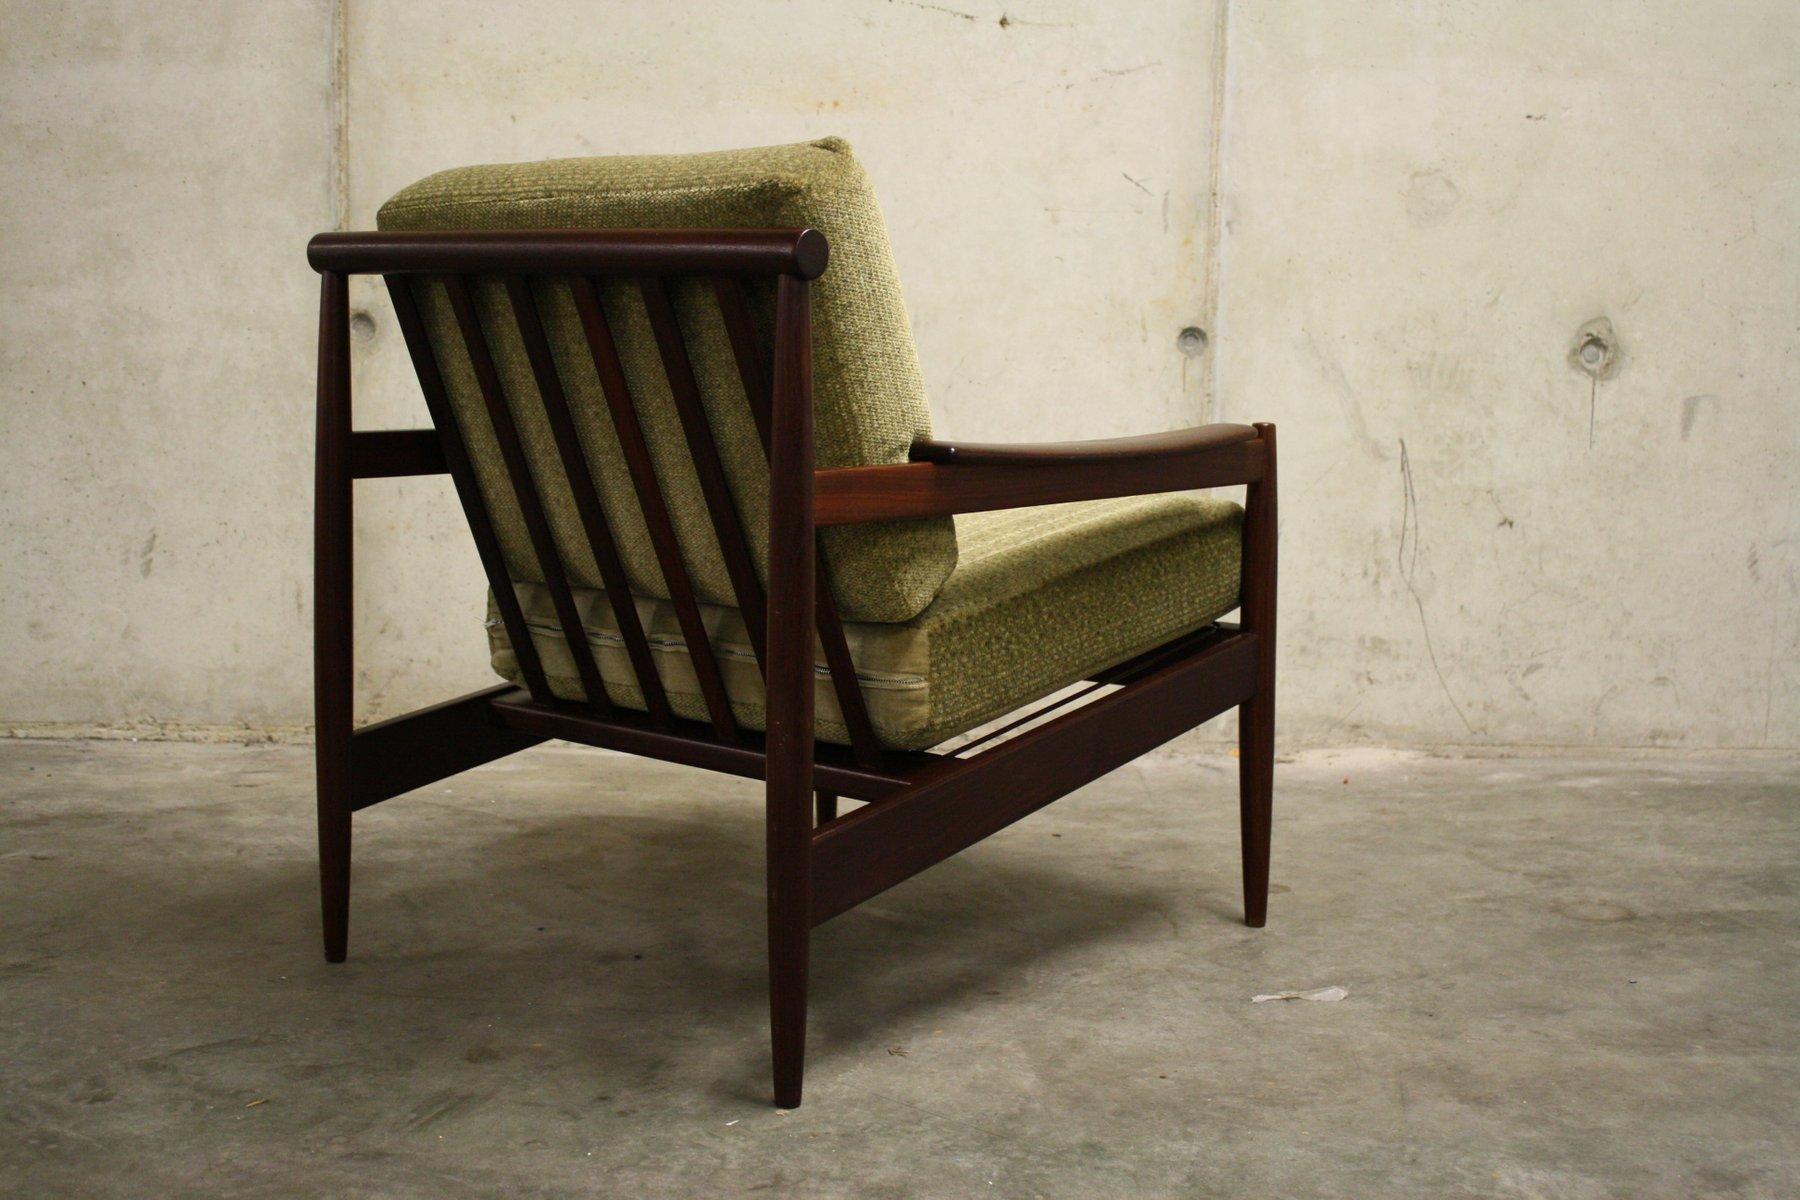 skandinavischer mid century teak sessel 1960er bei pamono kaufen. Black Bedroom Furniture Sets. Home Design Ideas